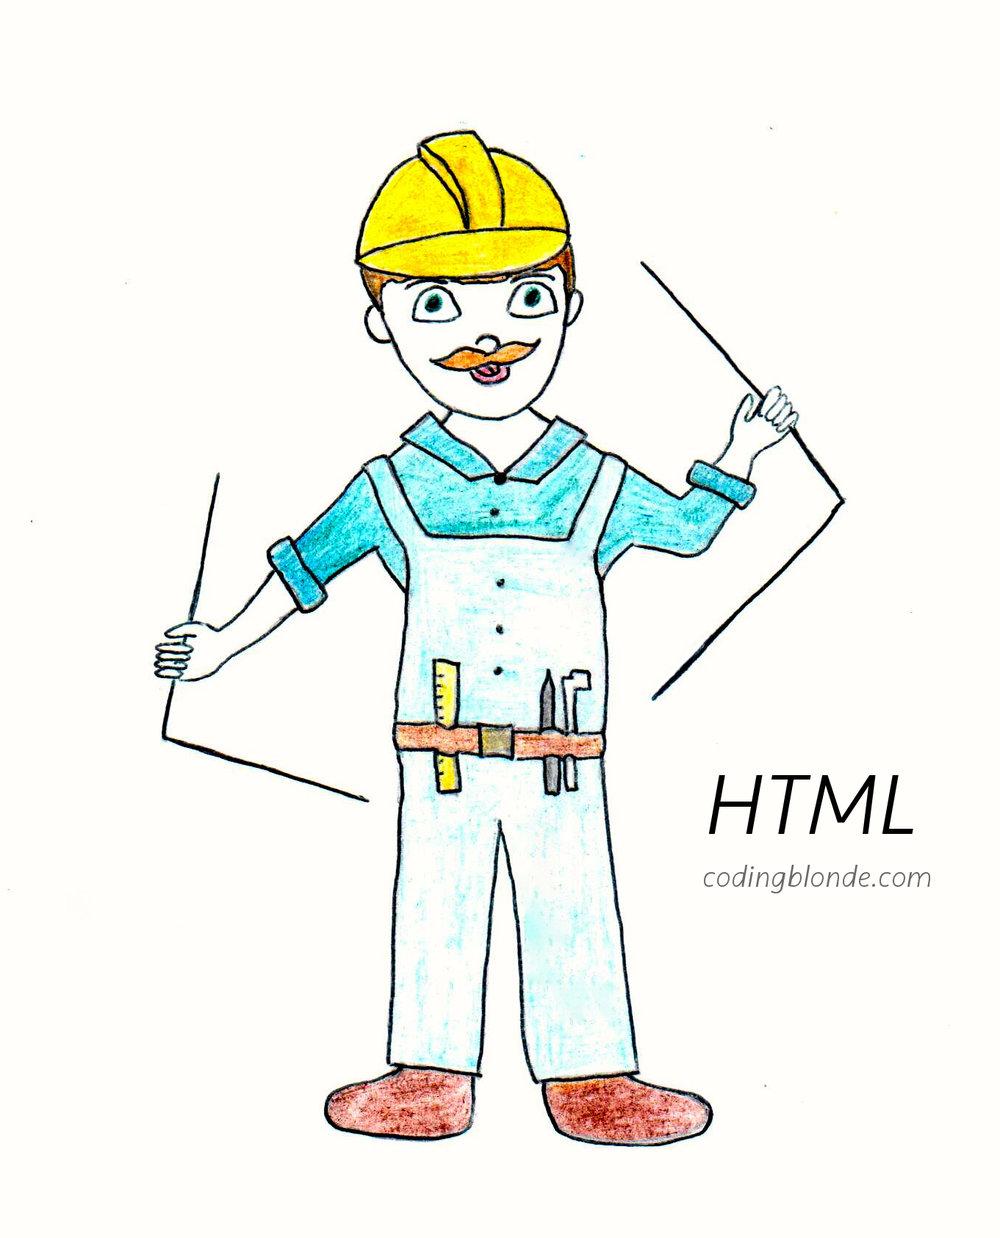 html personality coding blonde